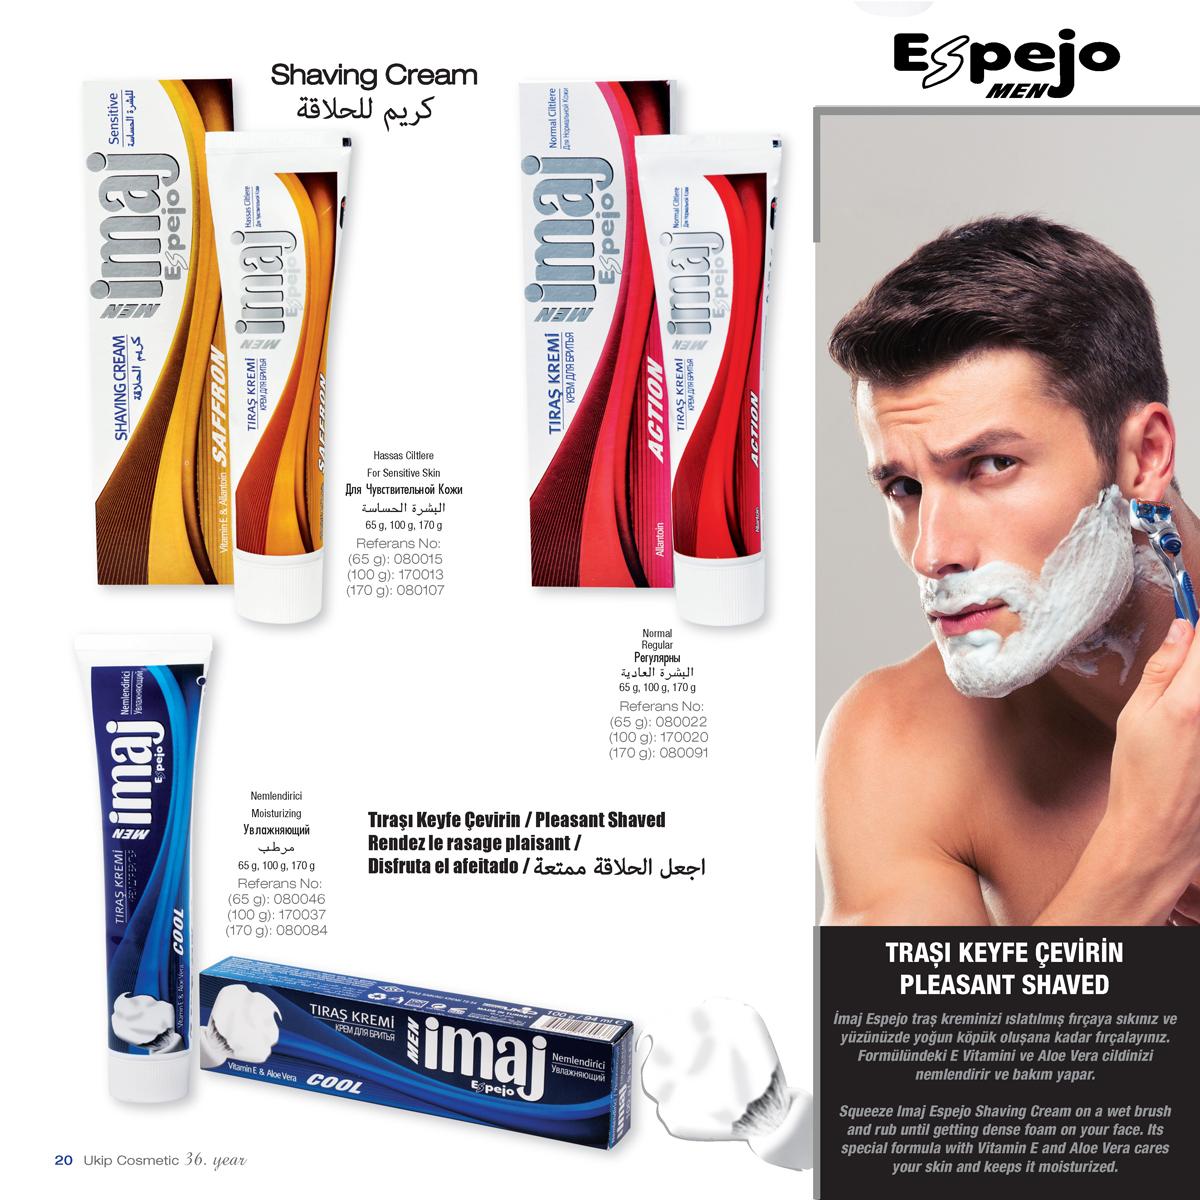 Espejo Shaving cream